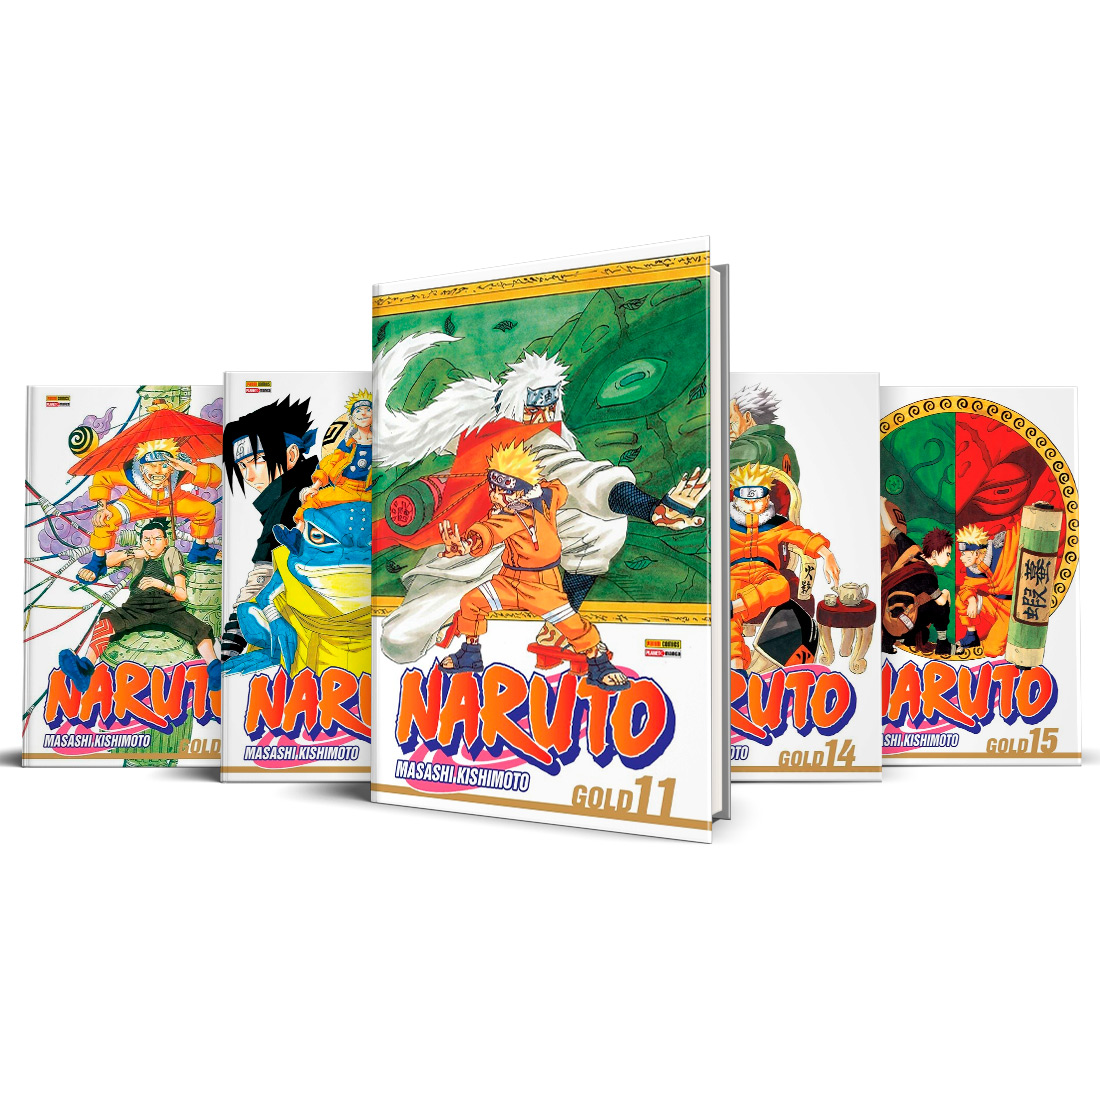 Box Naruto Gold Vols. 11 ao 15